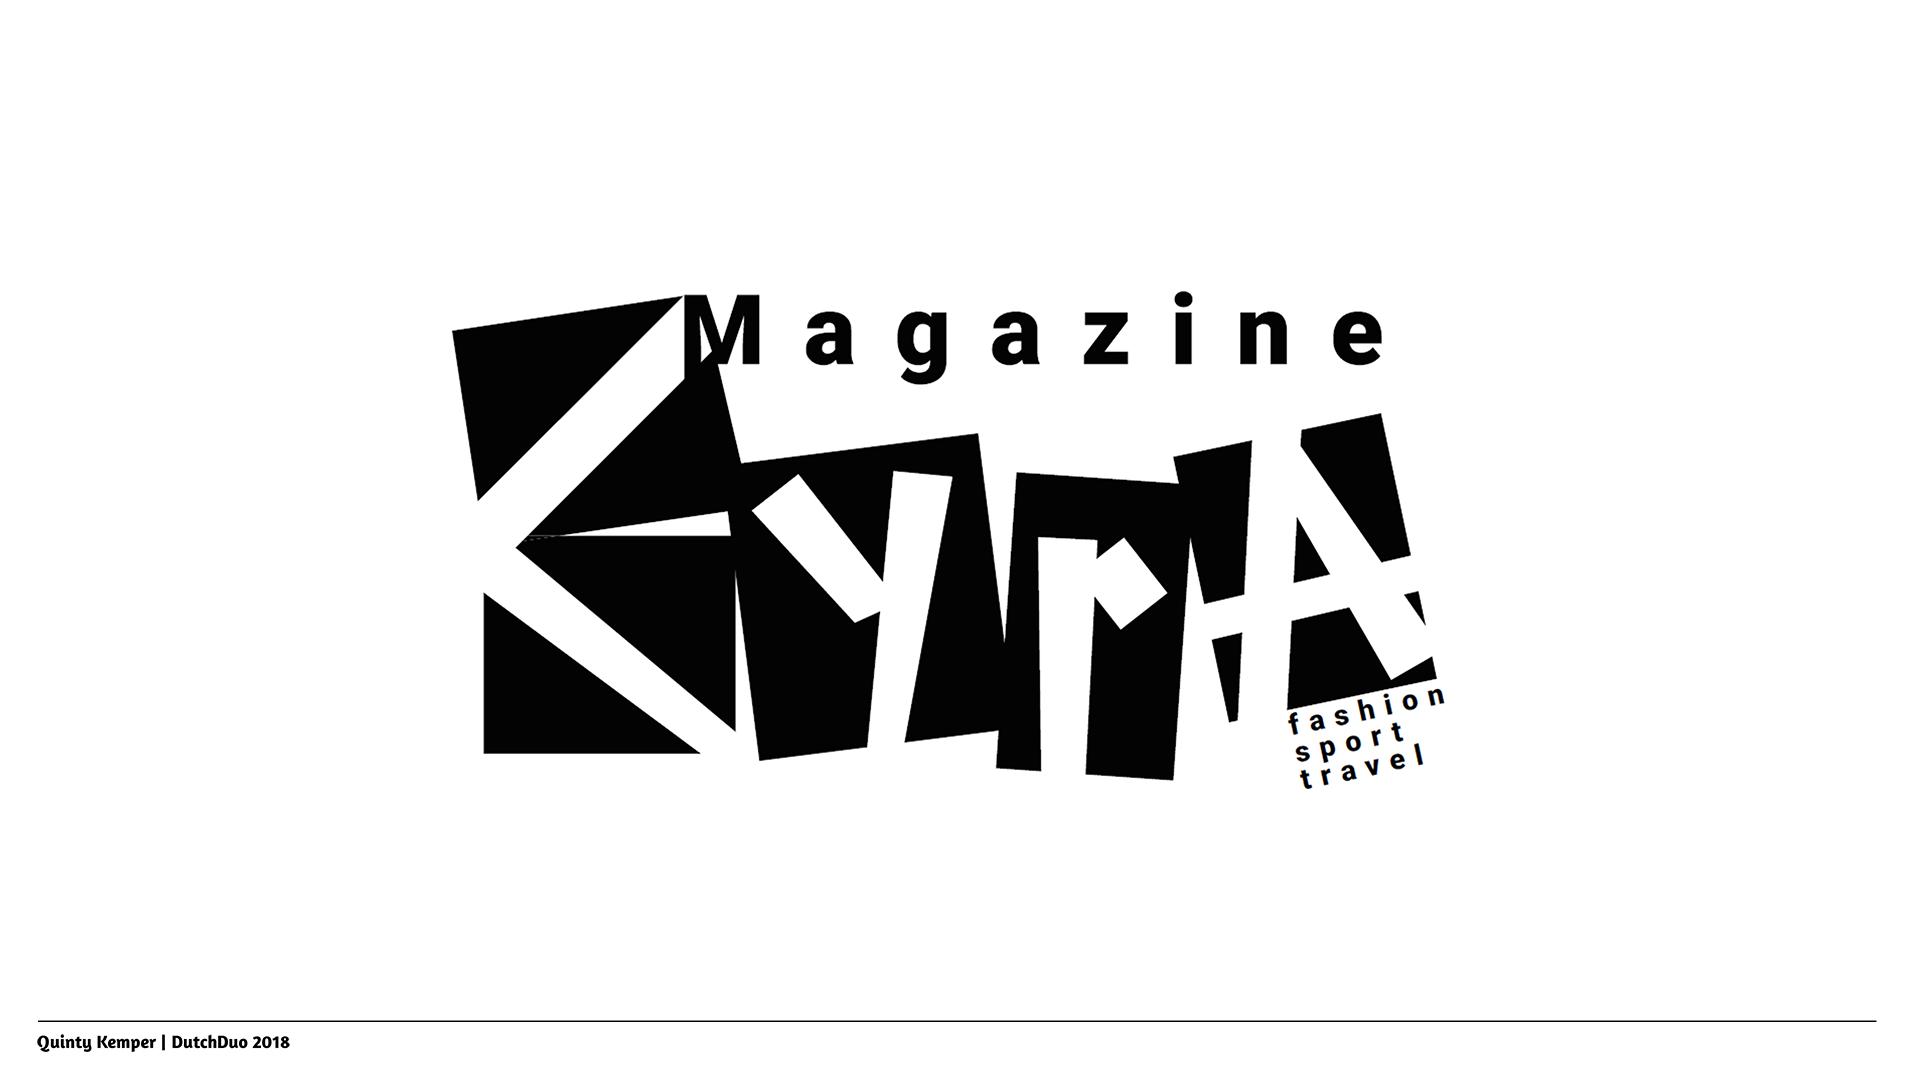 Quinty Kemper Portfolio 2018 Kyra logo 2